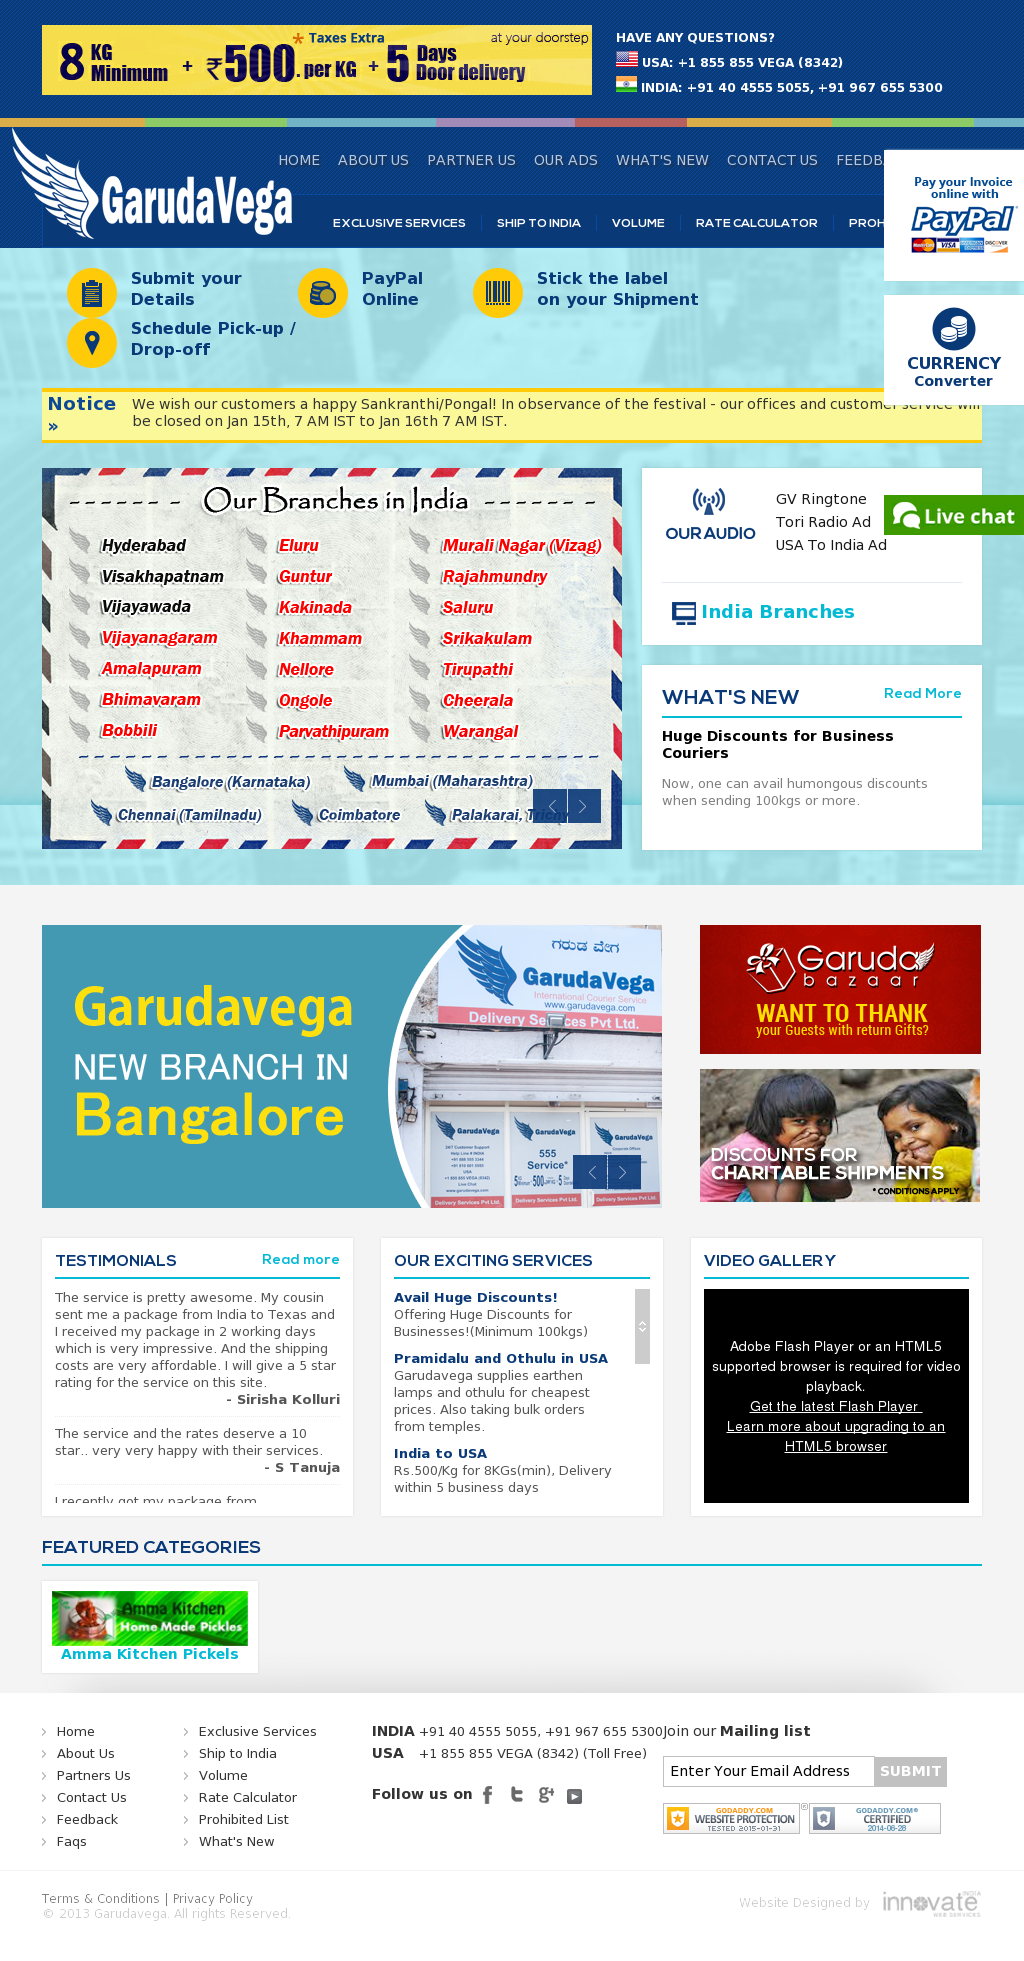 Garudavega Competitors, Revenue and Employees - Owler